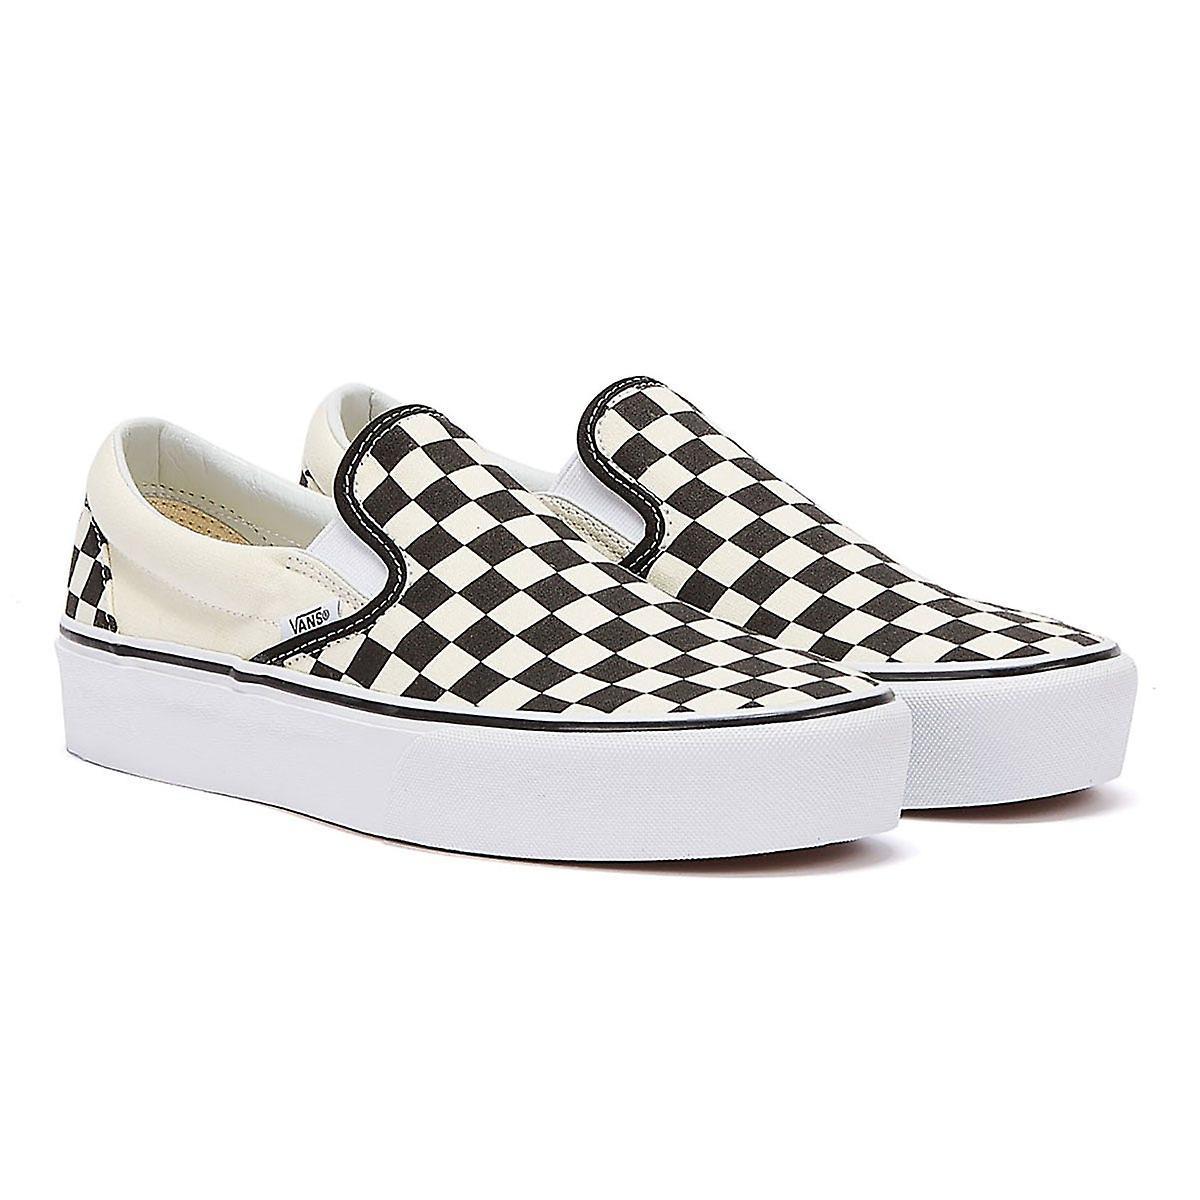 Vans Womens Black / White Checkerboard